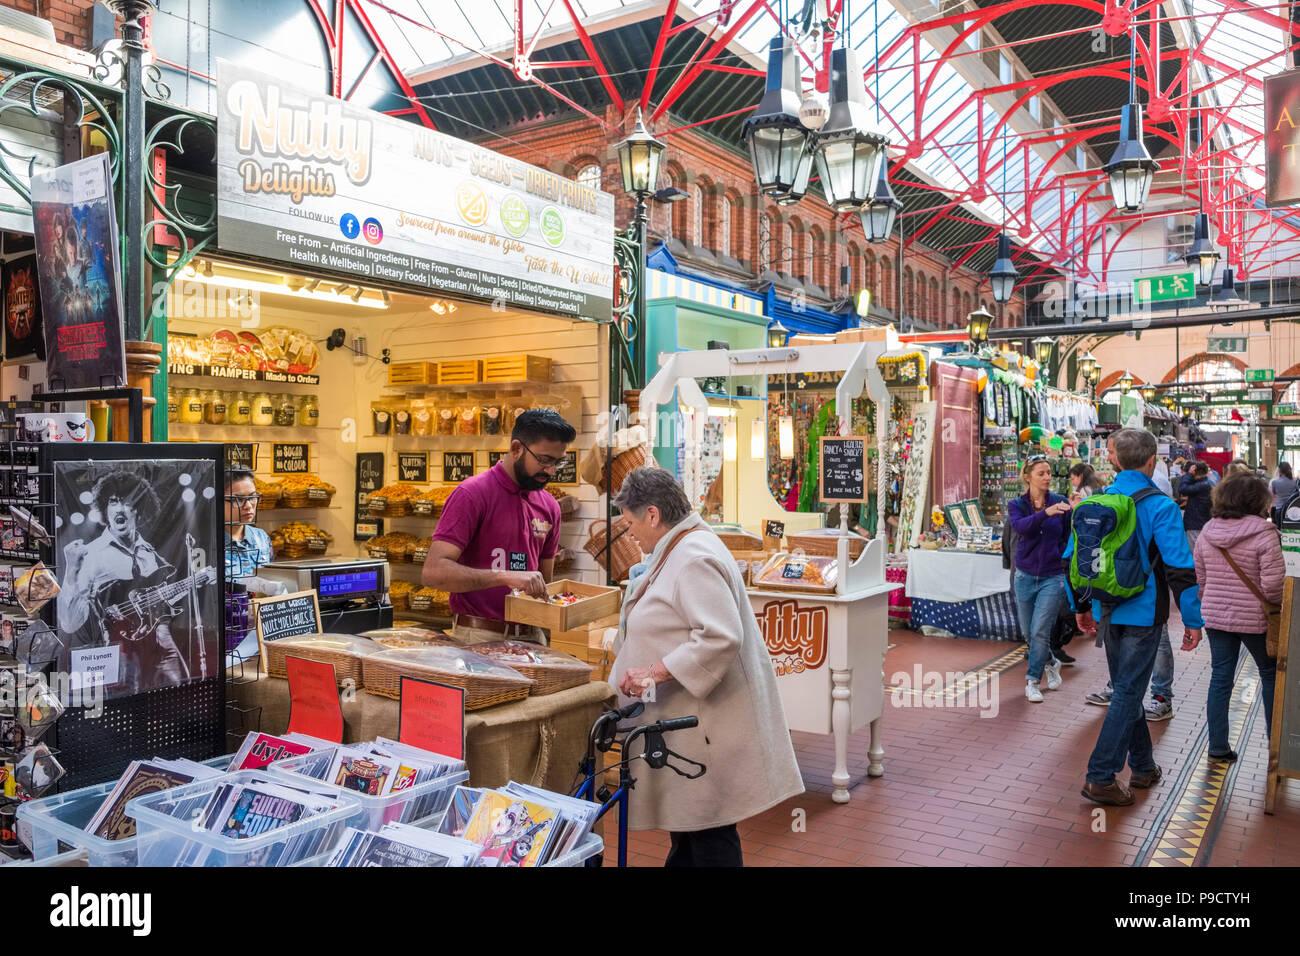 Georges Street Market Arcade, Dublin, Ireland, Europe - Stock Image